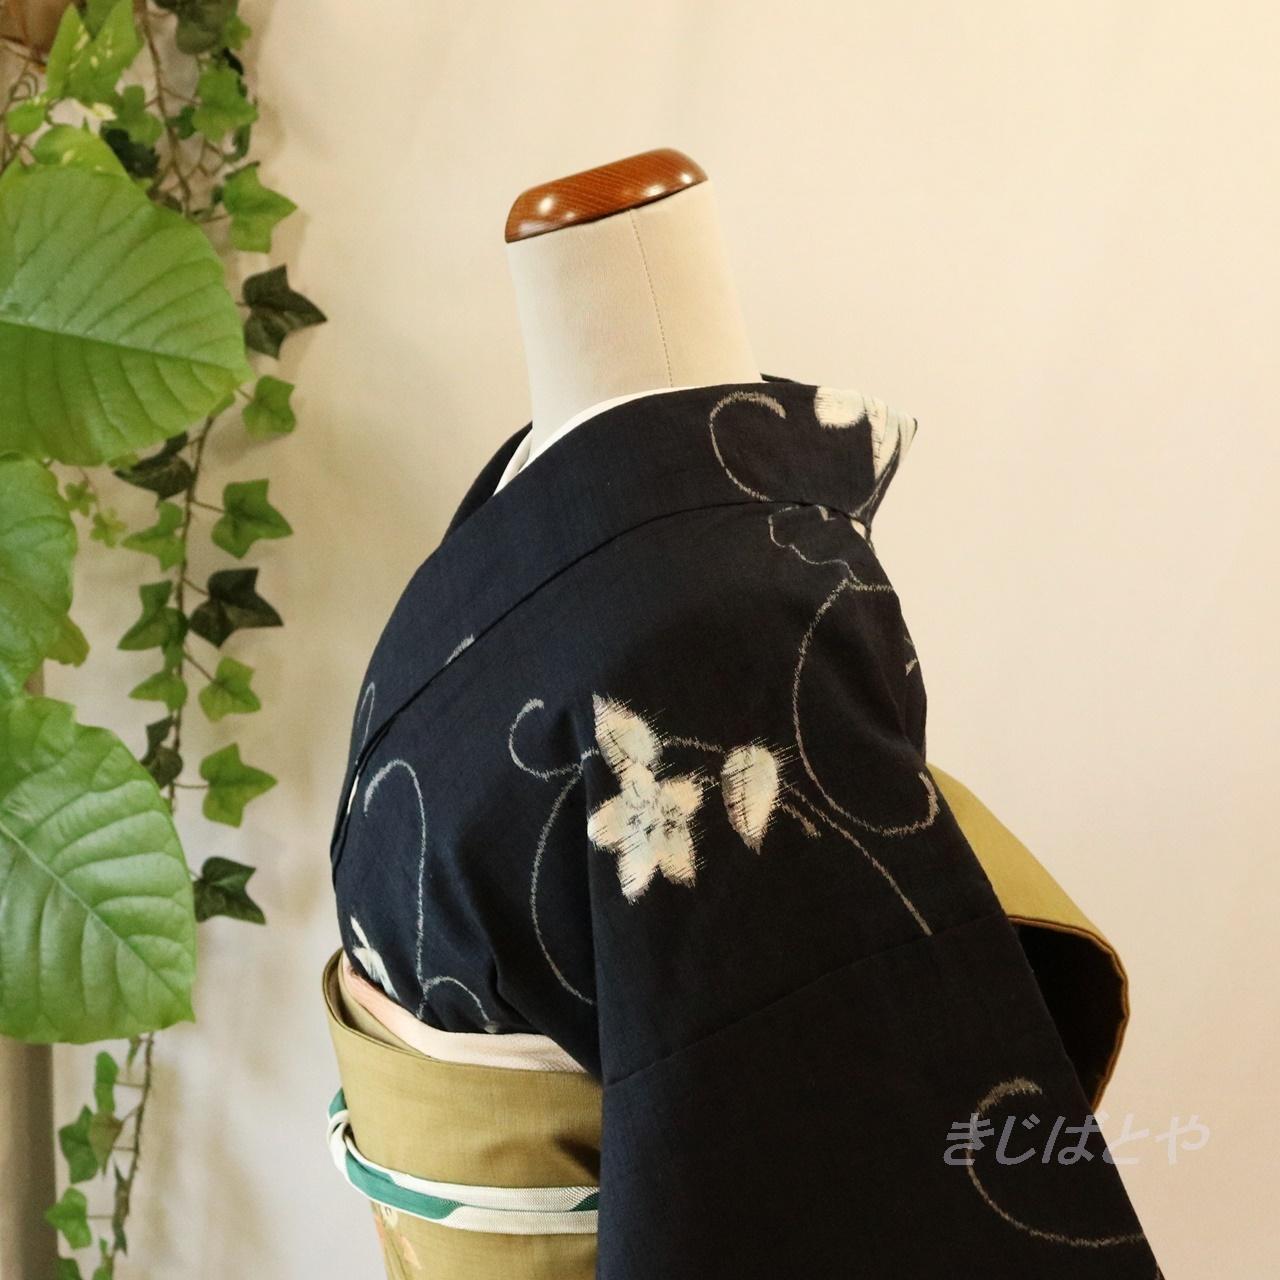 正絹紬 濃紺に白花の総柄小紋 袷